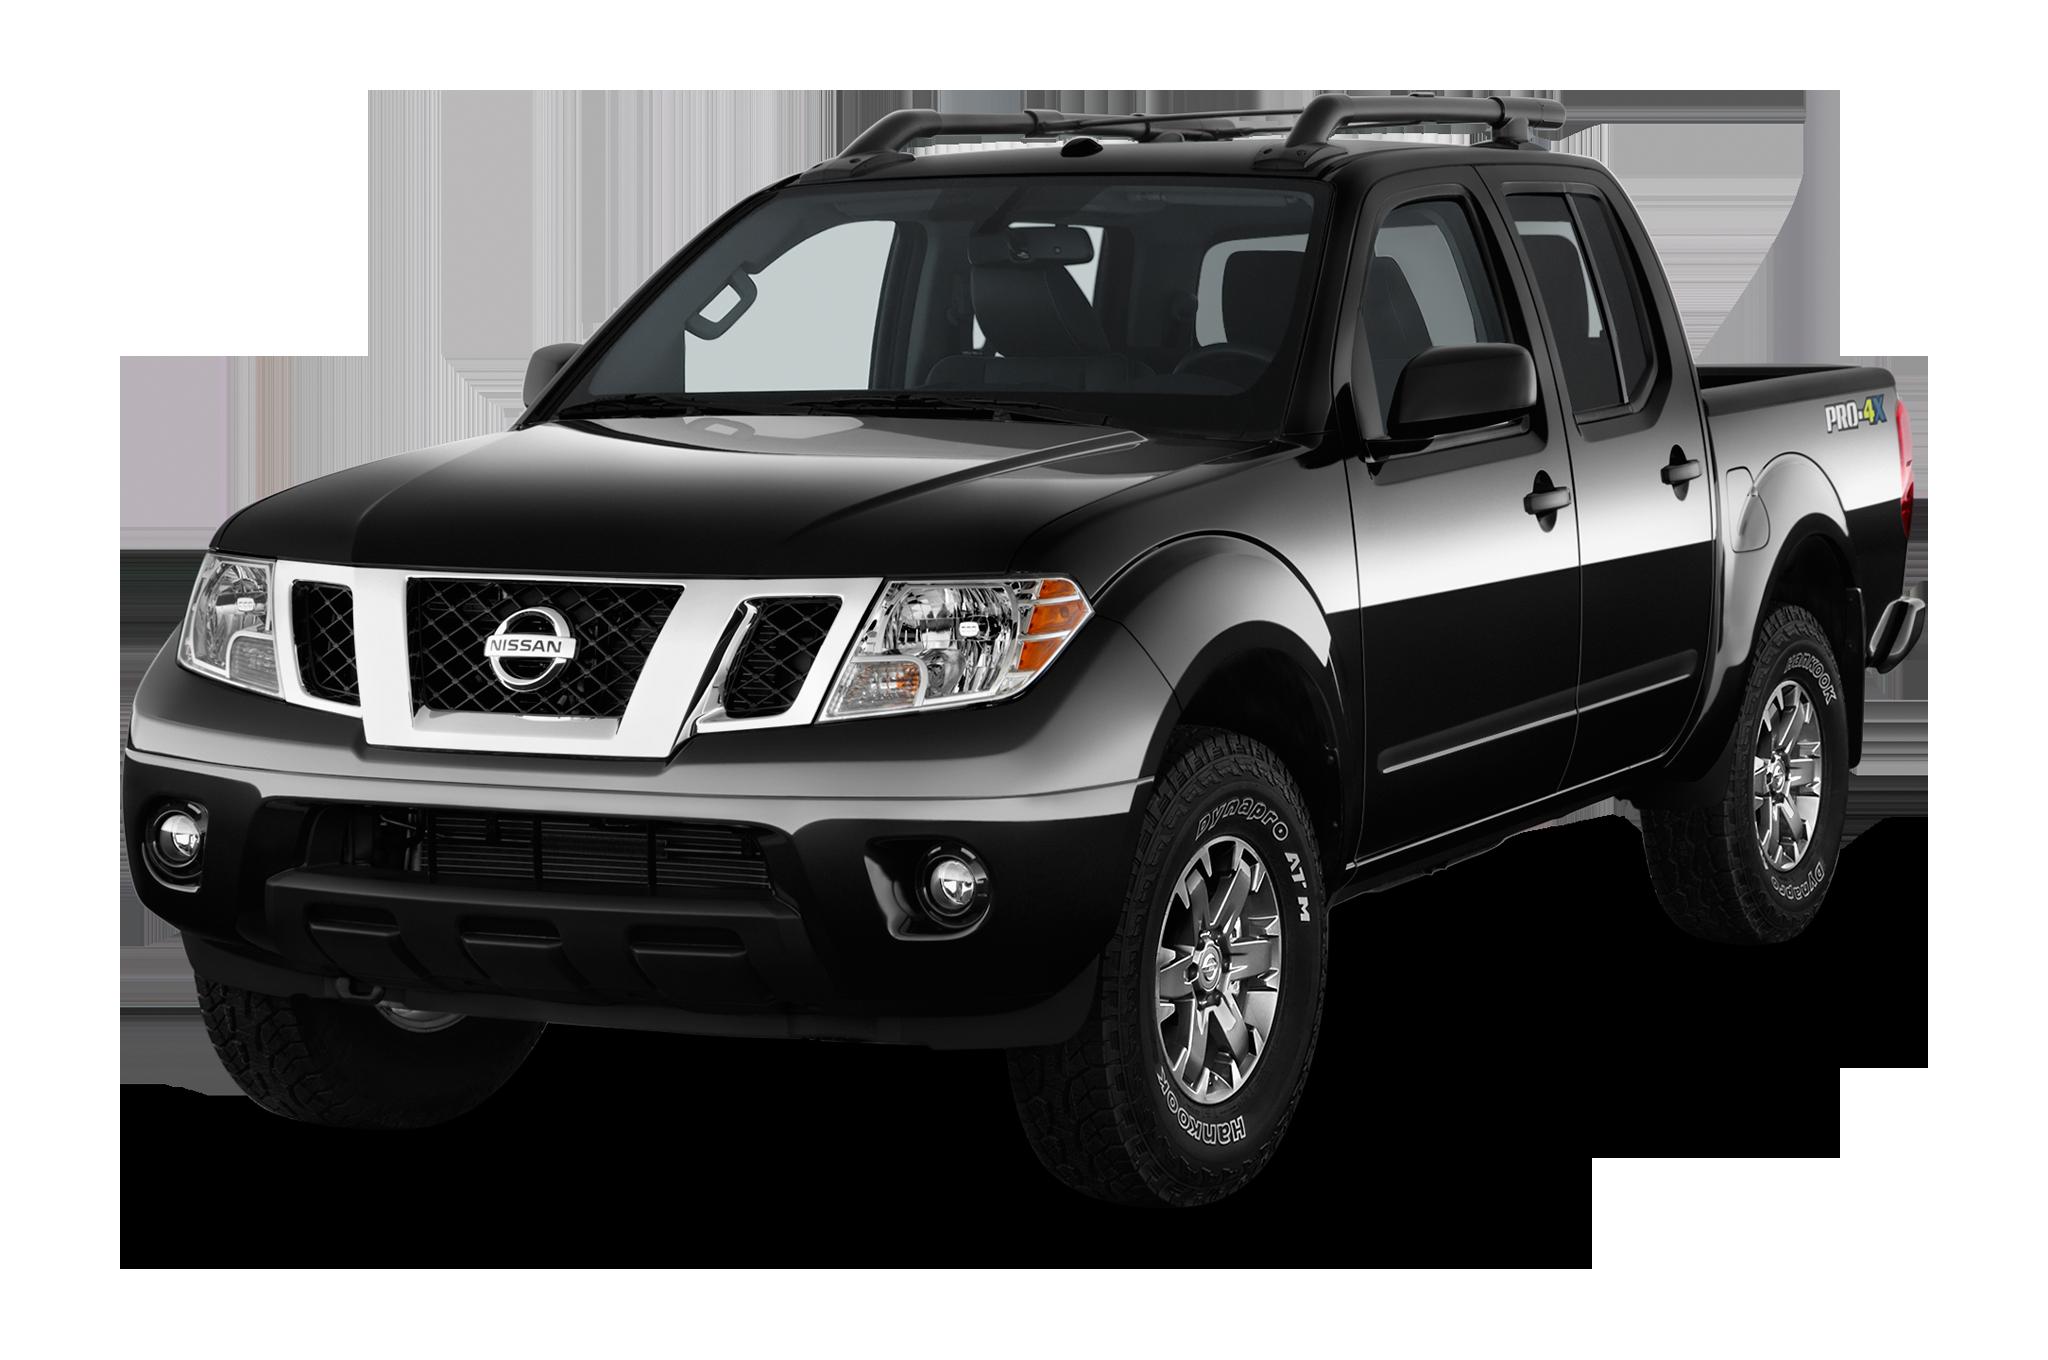 2018 Nissan Frontier Offers More Standard Goodies